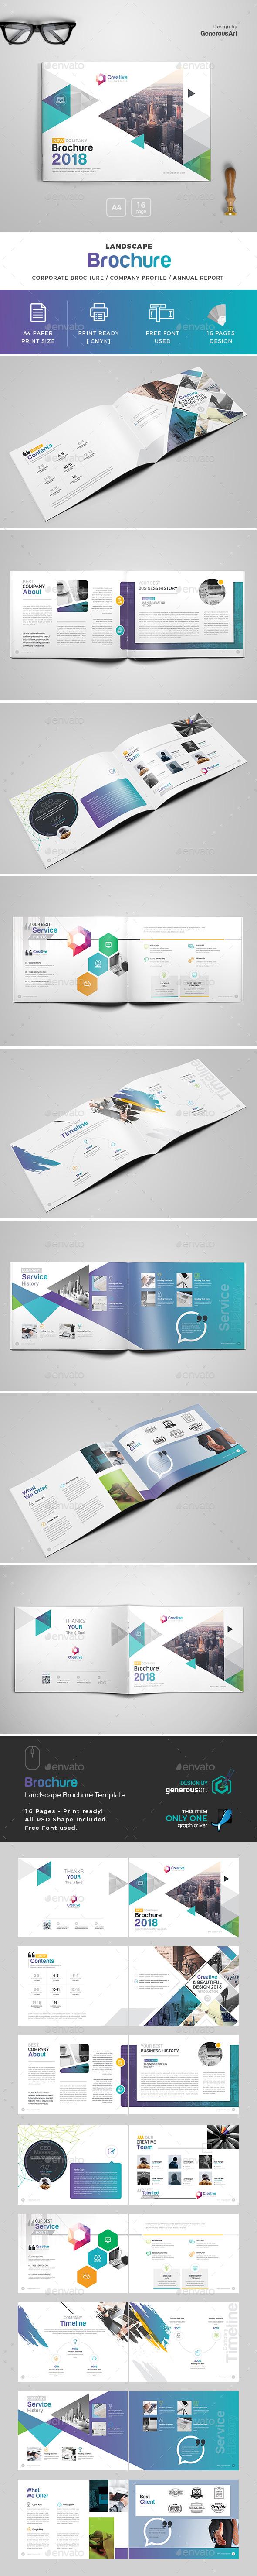 GraphicRiver 2018 Landscape Brochure Template 20777605